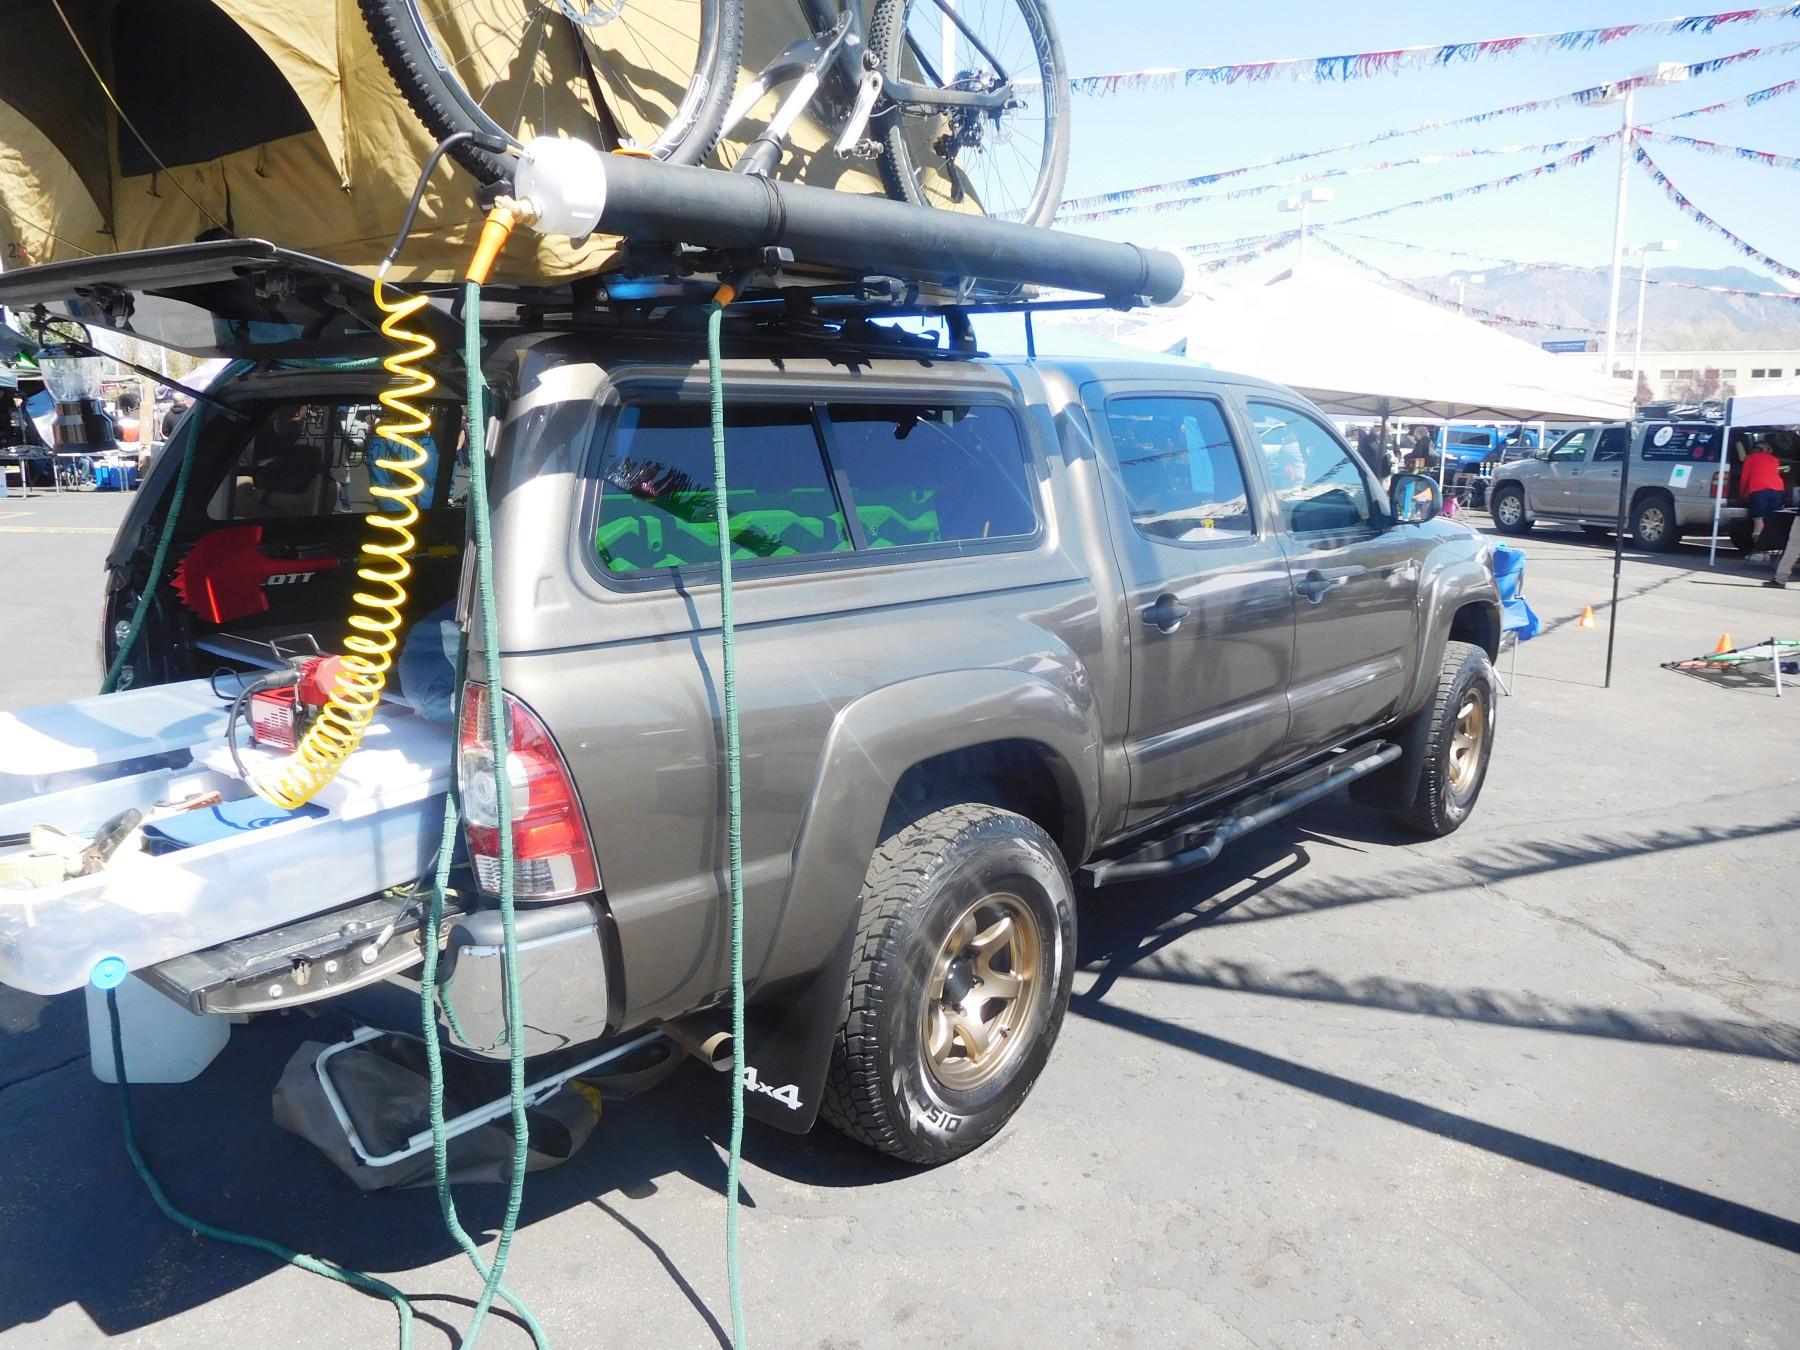 DIY Roof Rack Shower  DIY PVC Rooftop Solar Shower for a Car Van SUV or Truck